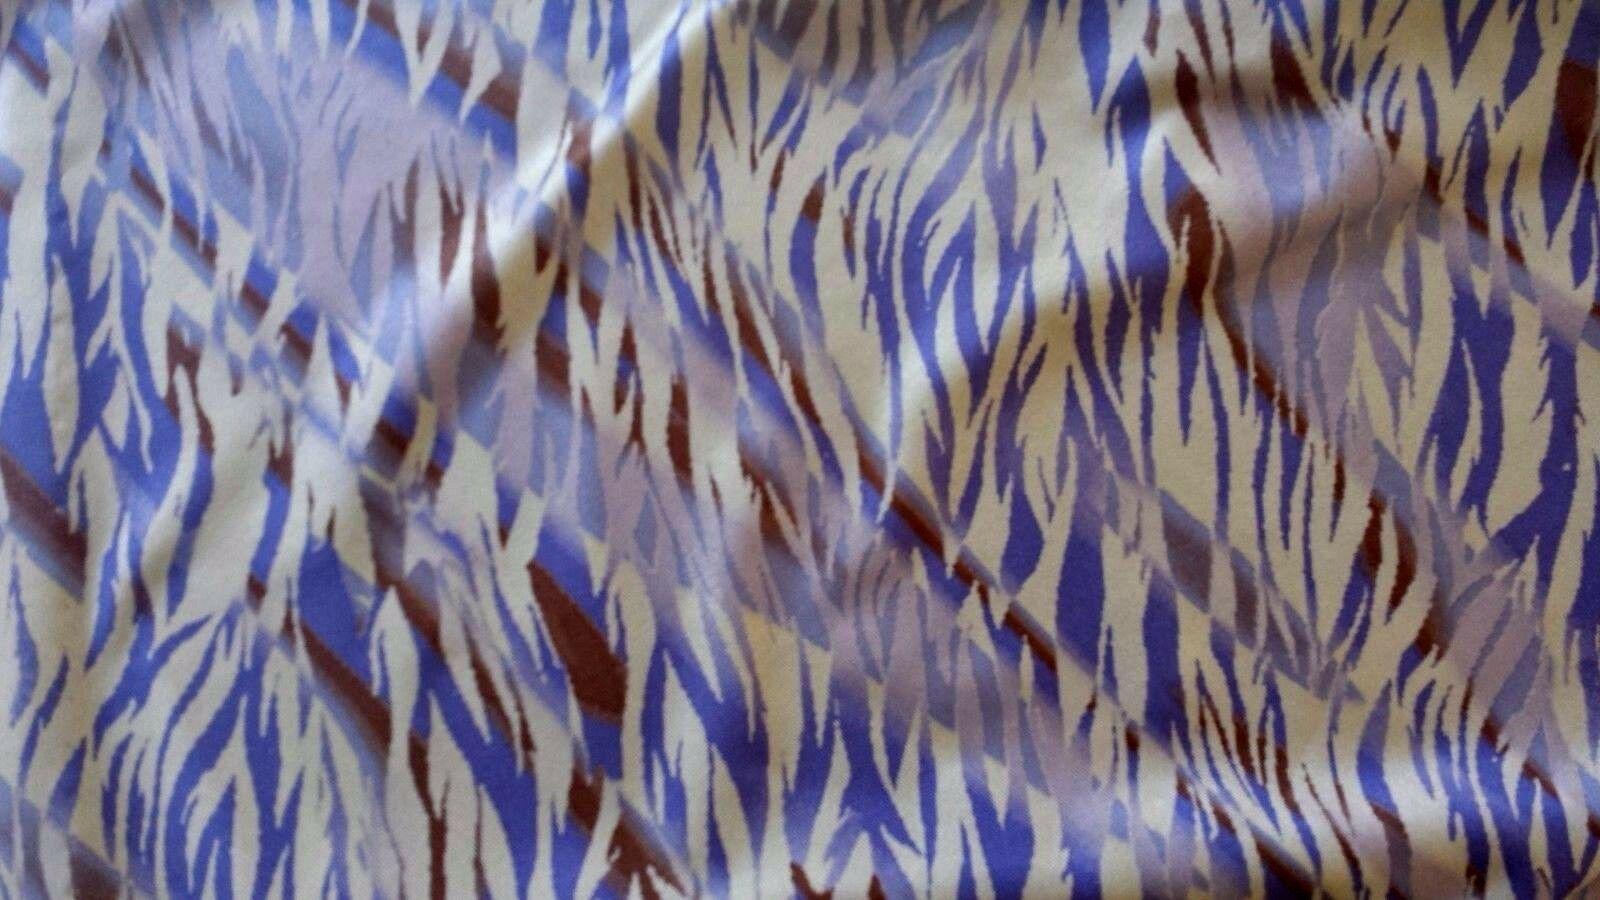 Stylish Golf/Casual Animal Print Golf Dress with Shortie - GoldenWear image 8